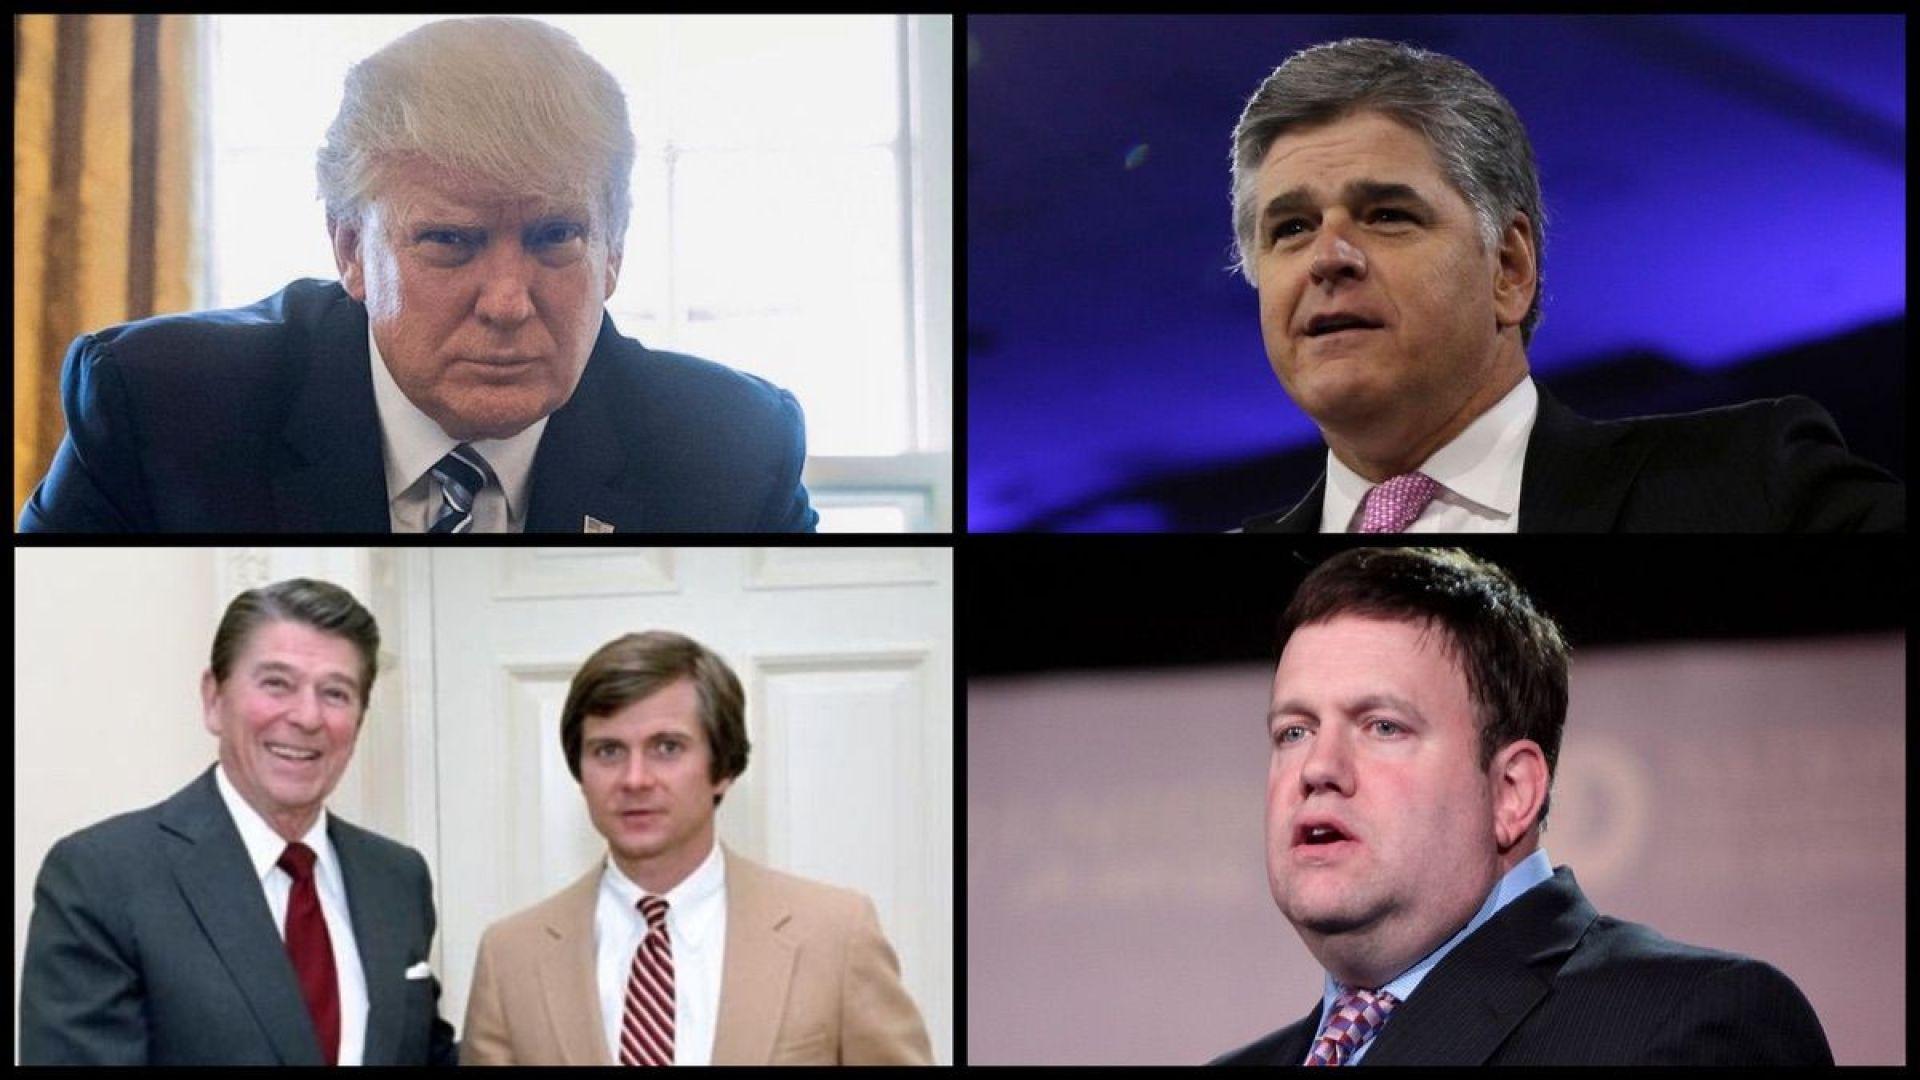 President Trump (AP), Fox News Anchor Sean Hannity (AP), President Reagan and GOP Strategist Lee Atwater (Bill Fitz-Patrick), and GOP Strategist Frank Luntz (Gage Skidmore)